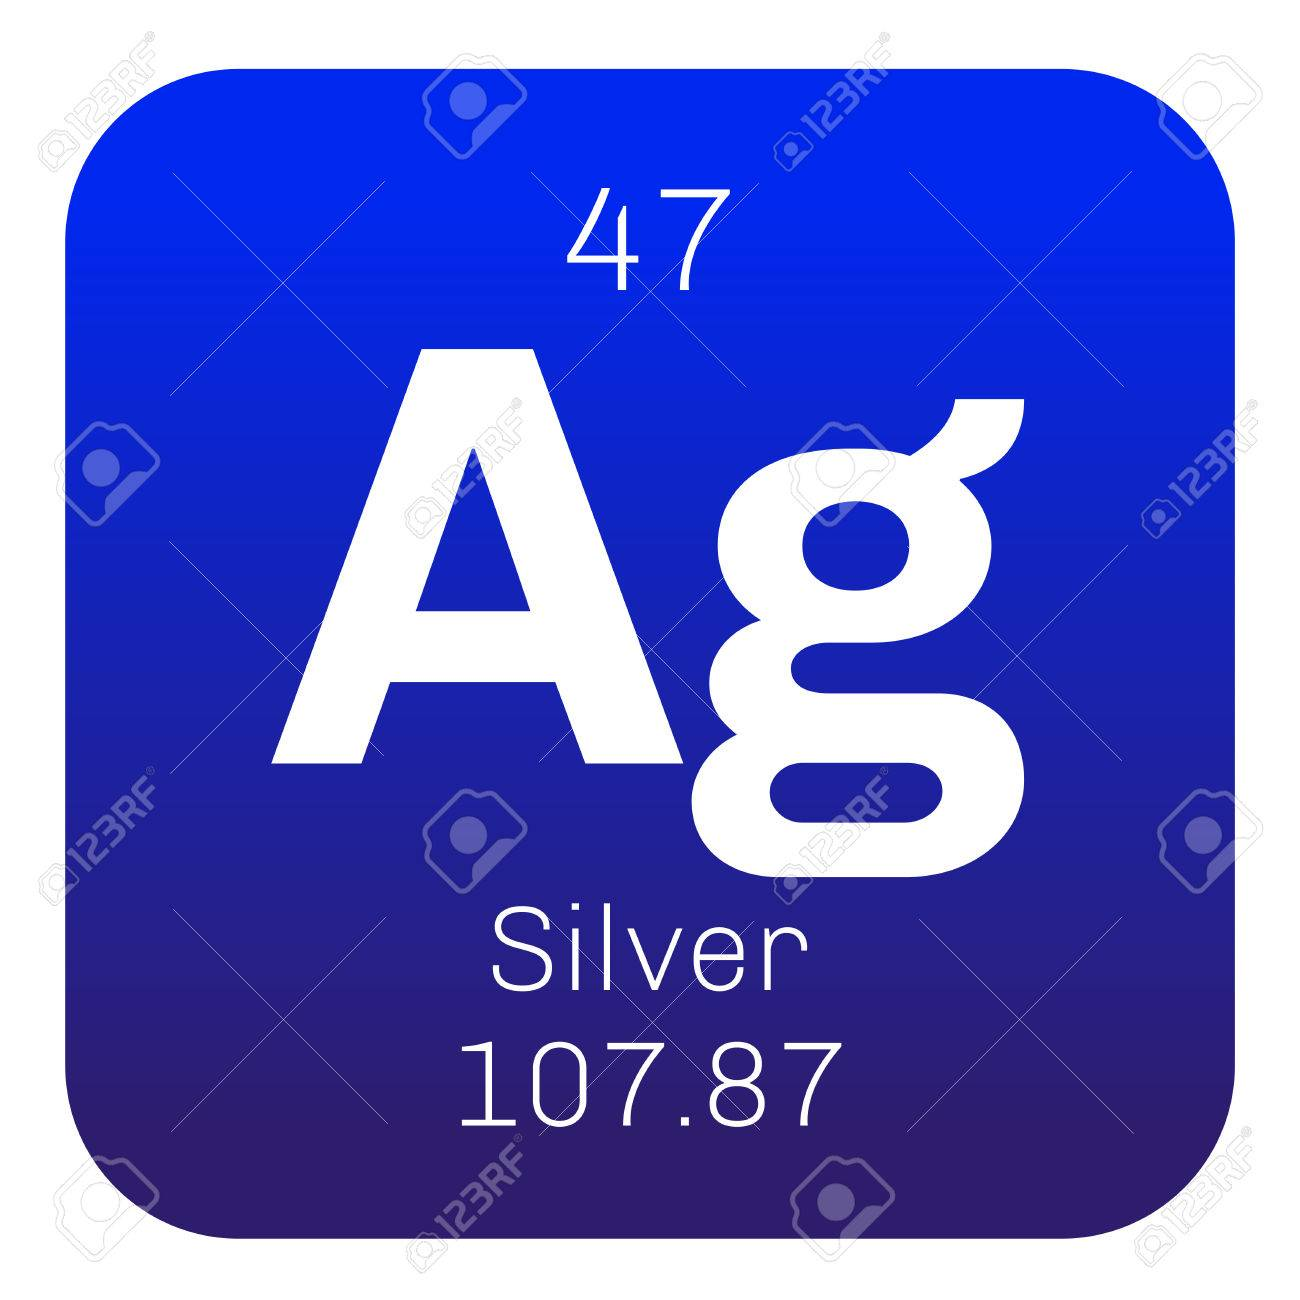 Elemento qumico de plata metal precioso icono de color con el elemento qumico de plata metal precioso icono de color con el nmero atmico y urtaz Choice Image